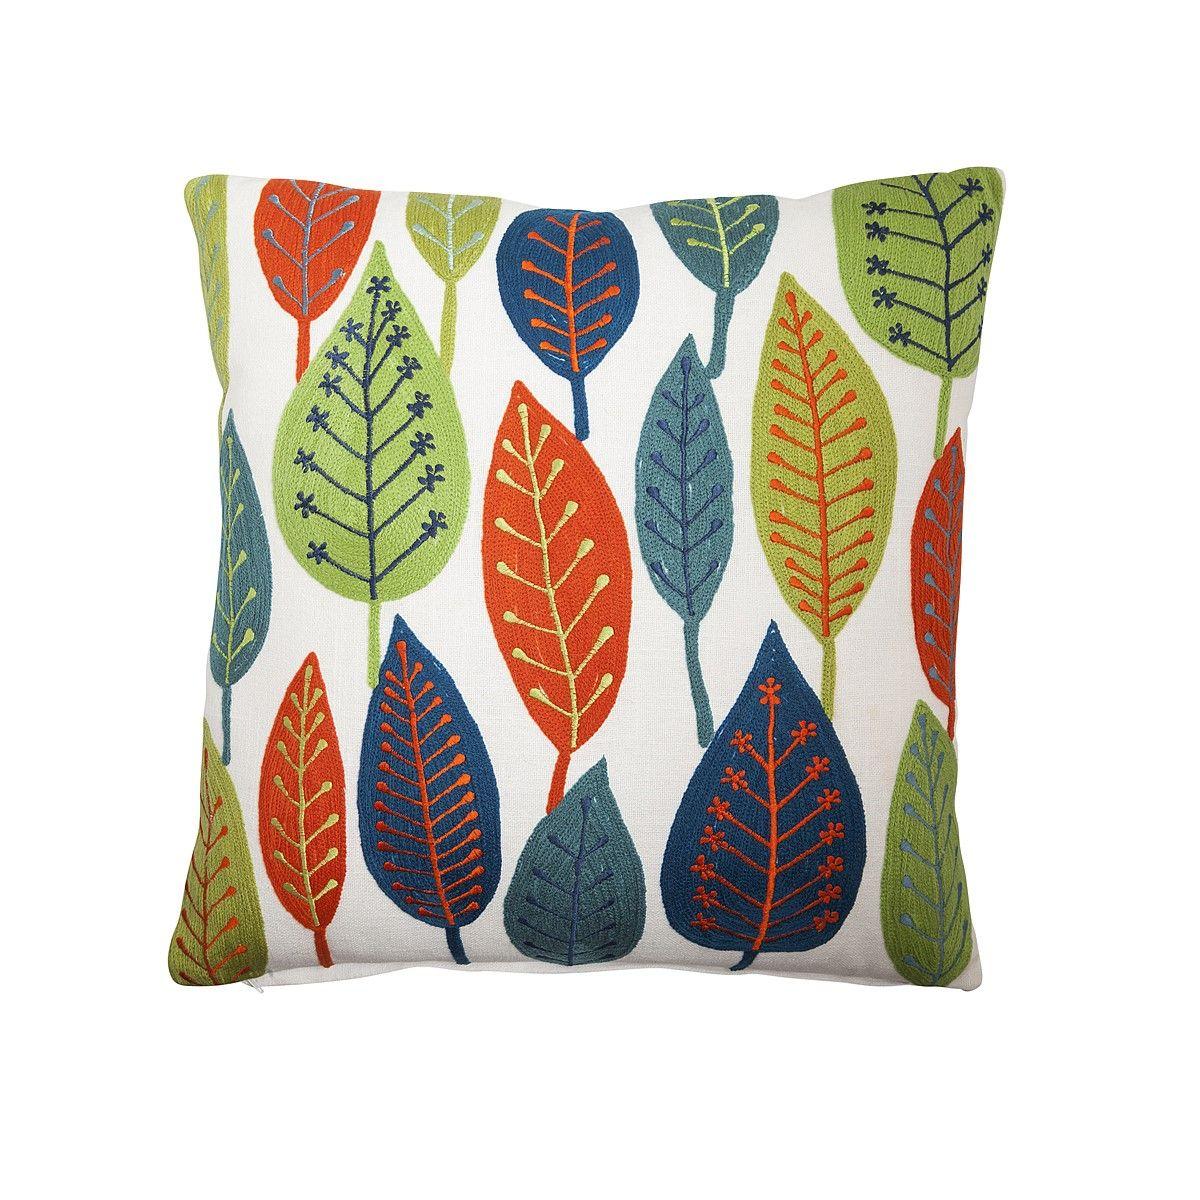 Cushions Home Decor Nood NZ leaf cushion I need Cushions